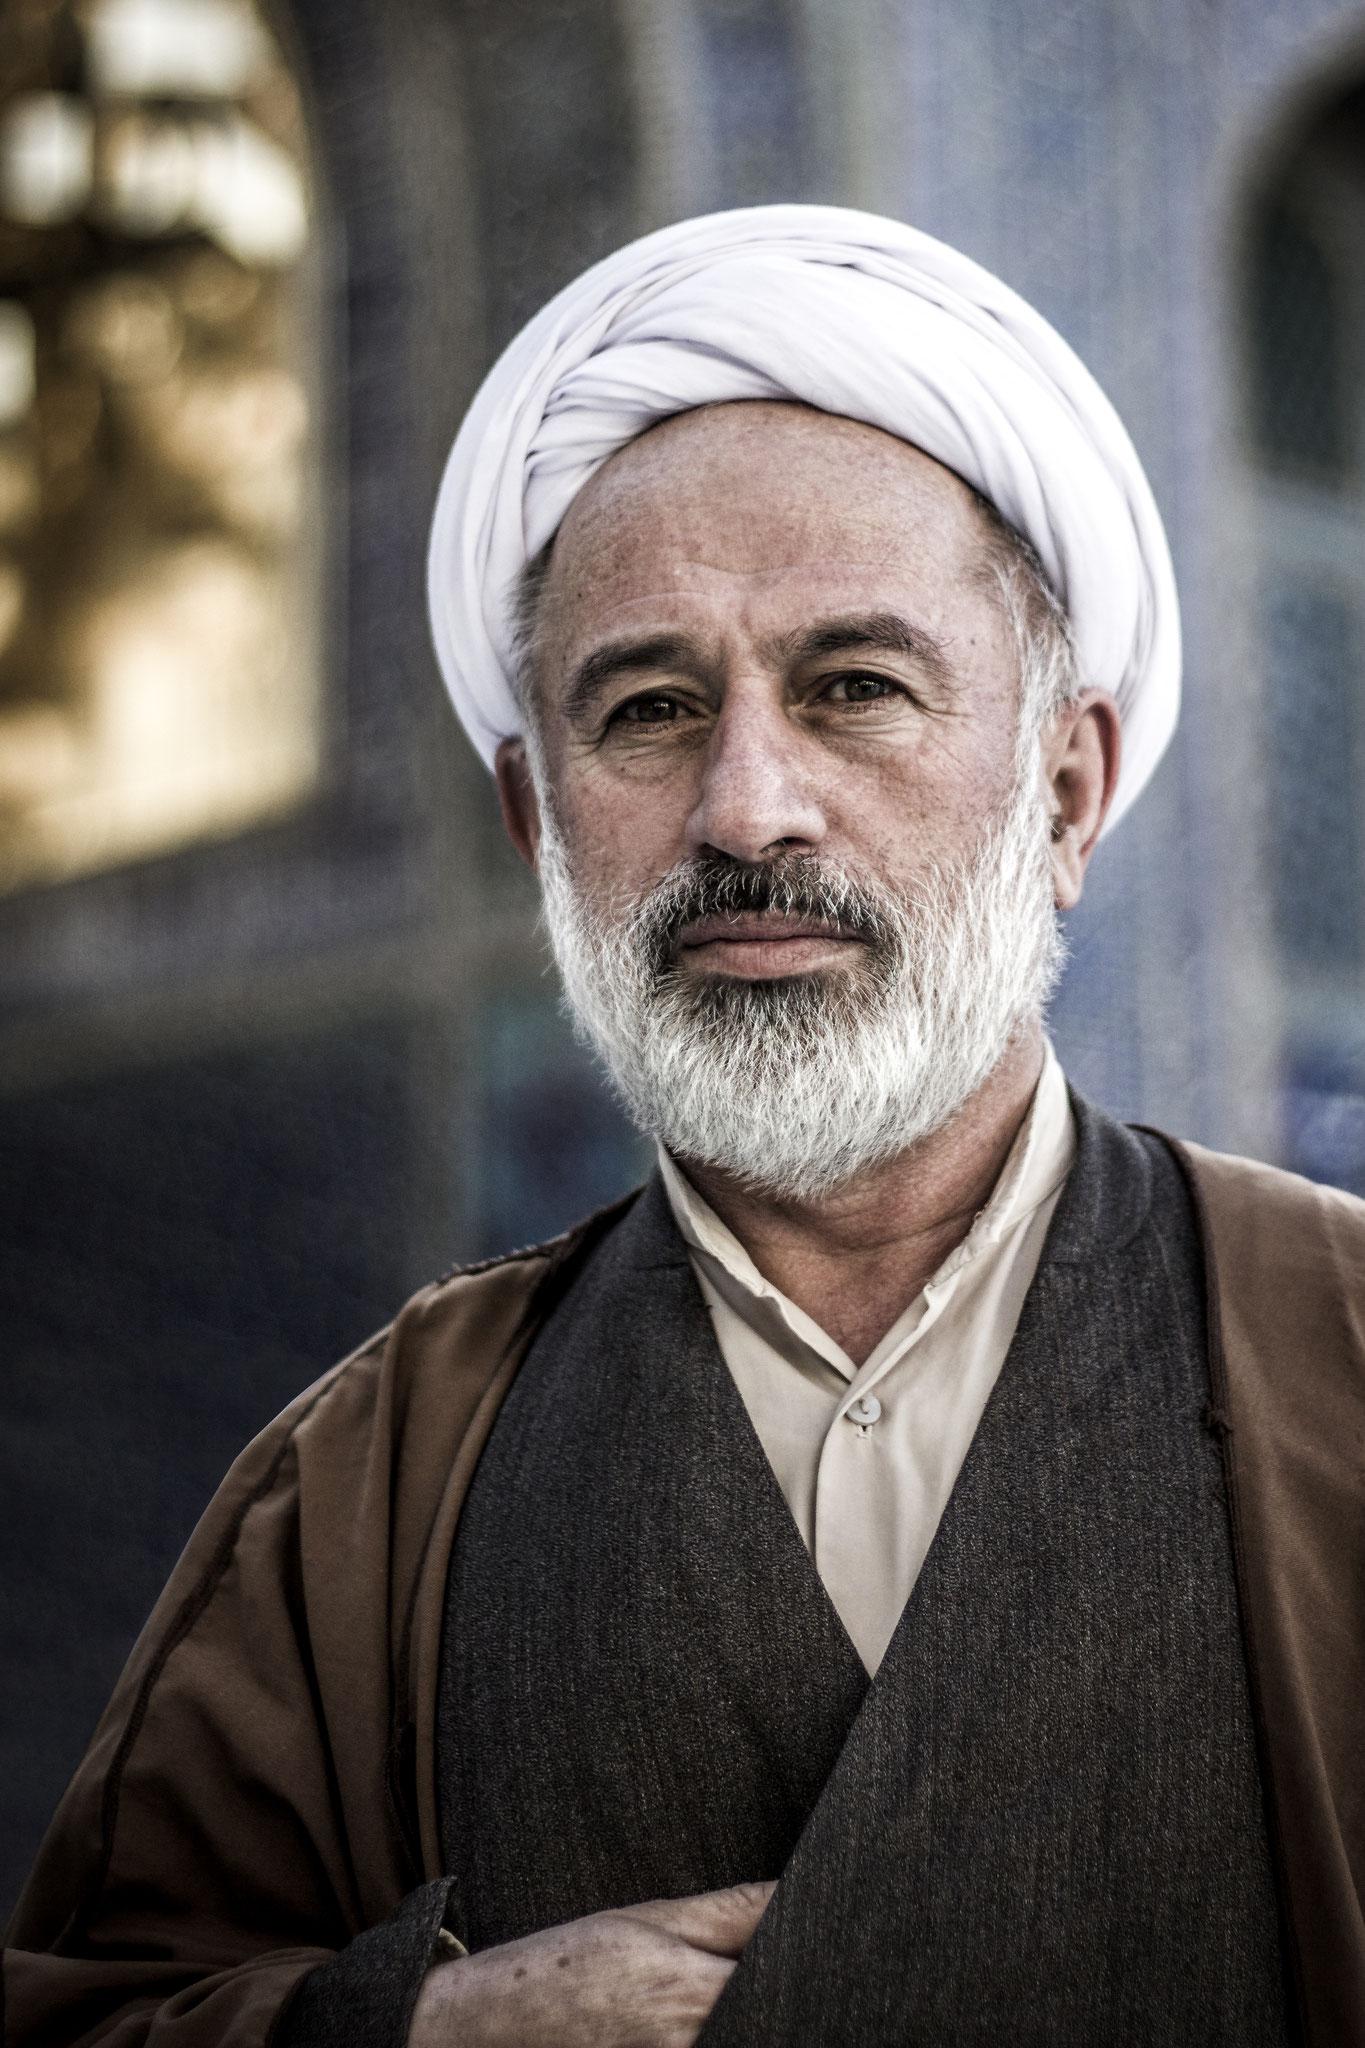 Qom - Iran © 2017 Nik Schwald.